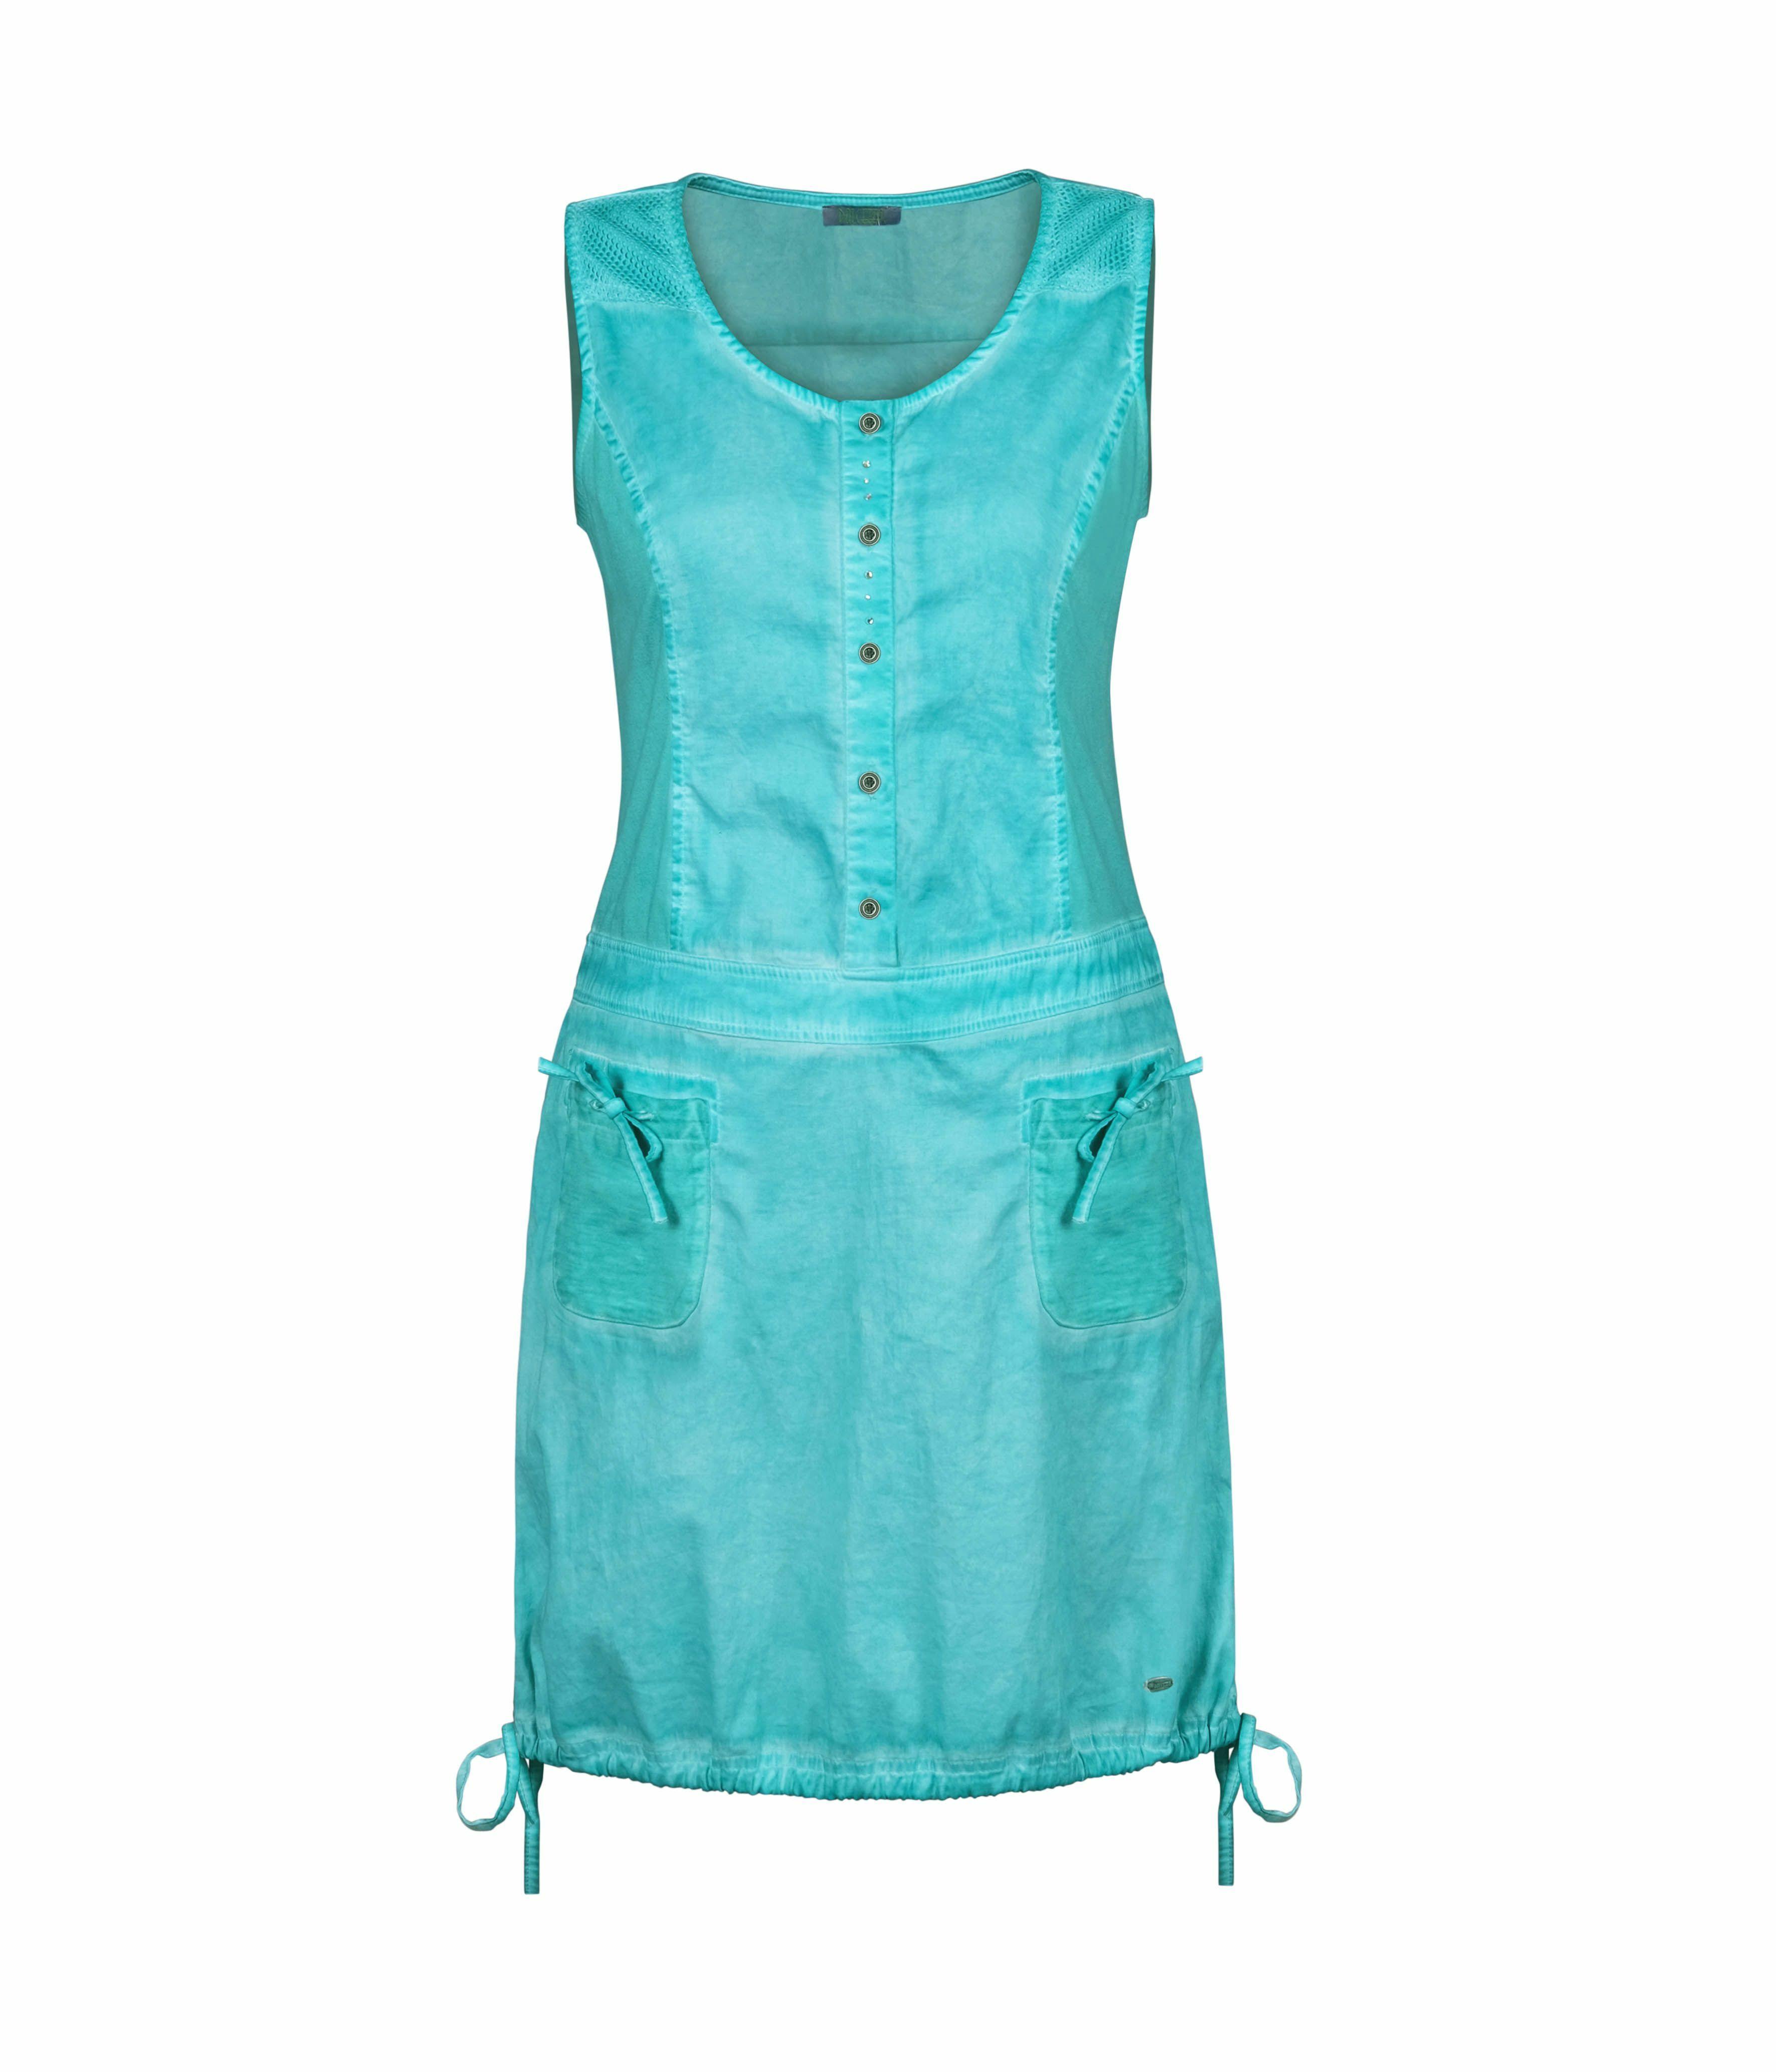 Dolcezza: Tropical Island Tied Hem Cotton Stretch Dress (1 Left!) DOLCEZZA_20200_TURQ